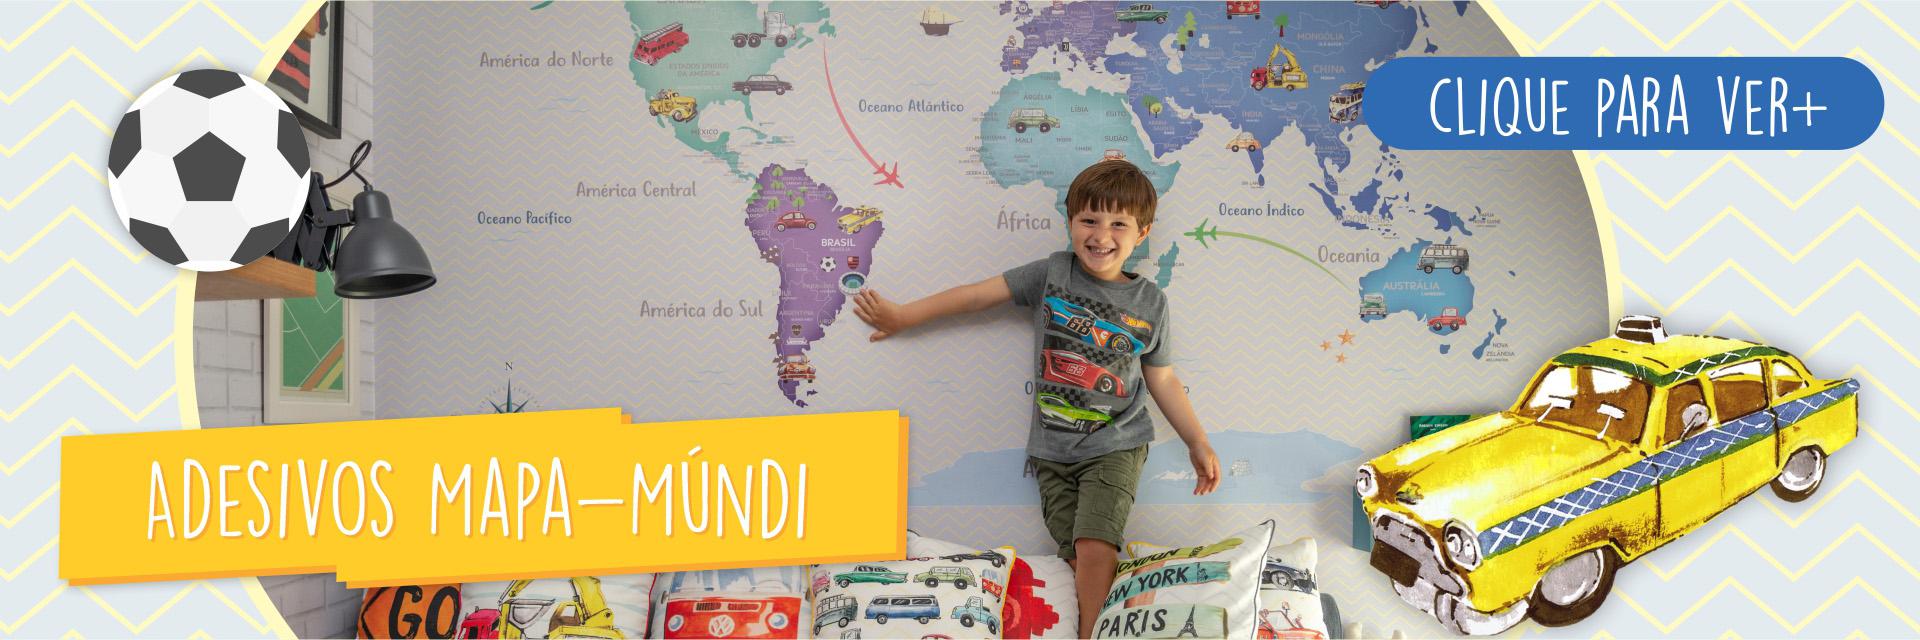 Full Banner Mapa Mundi